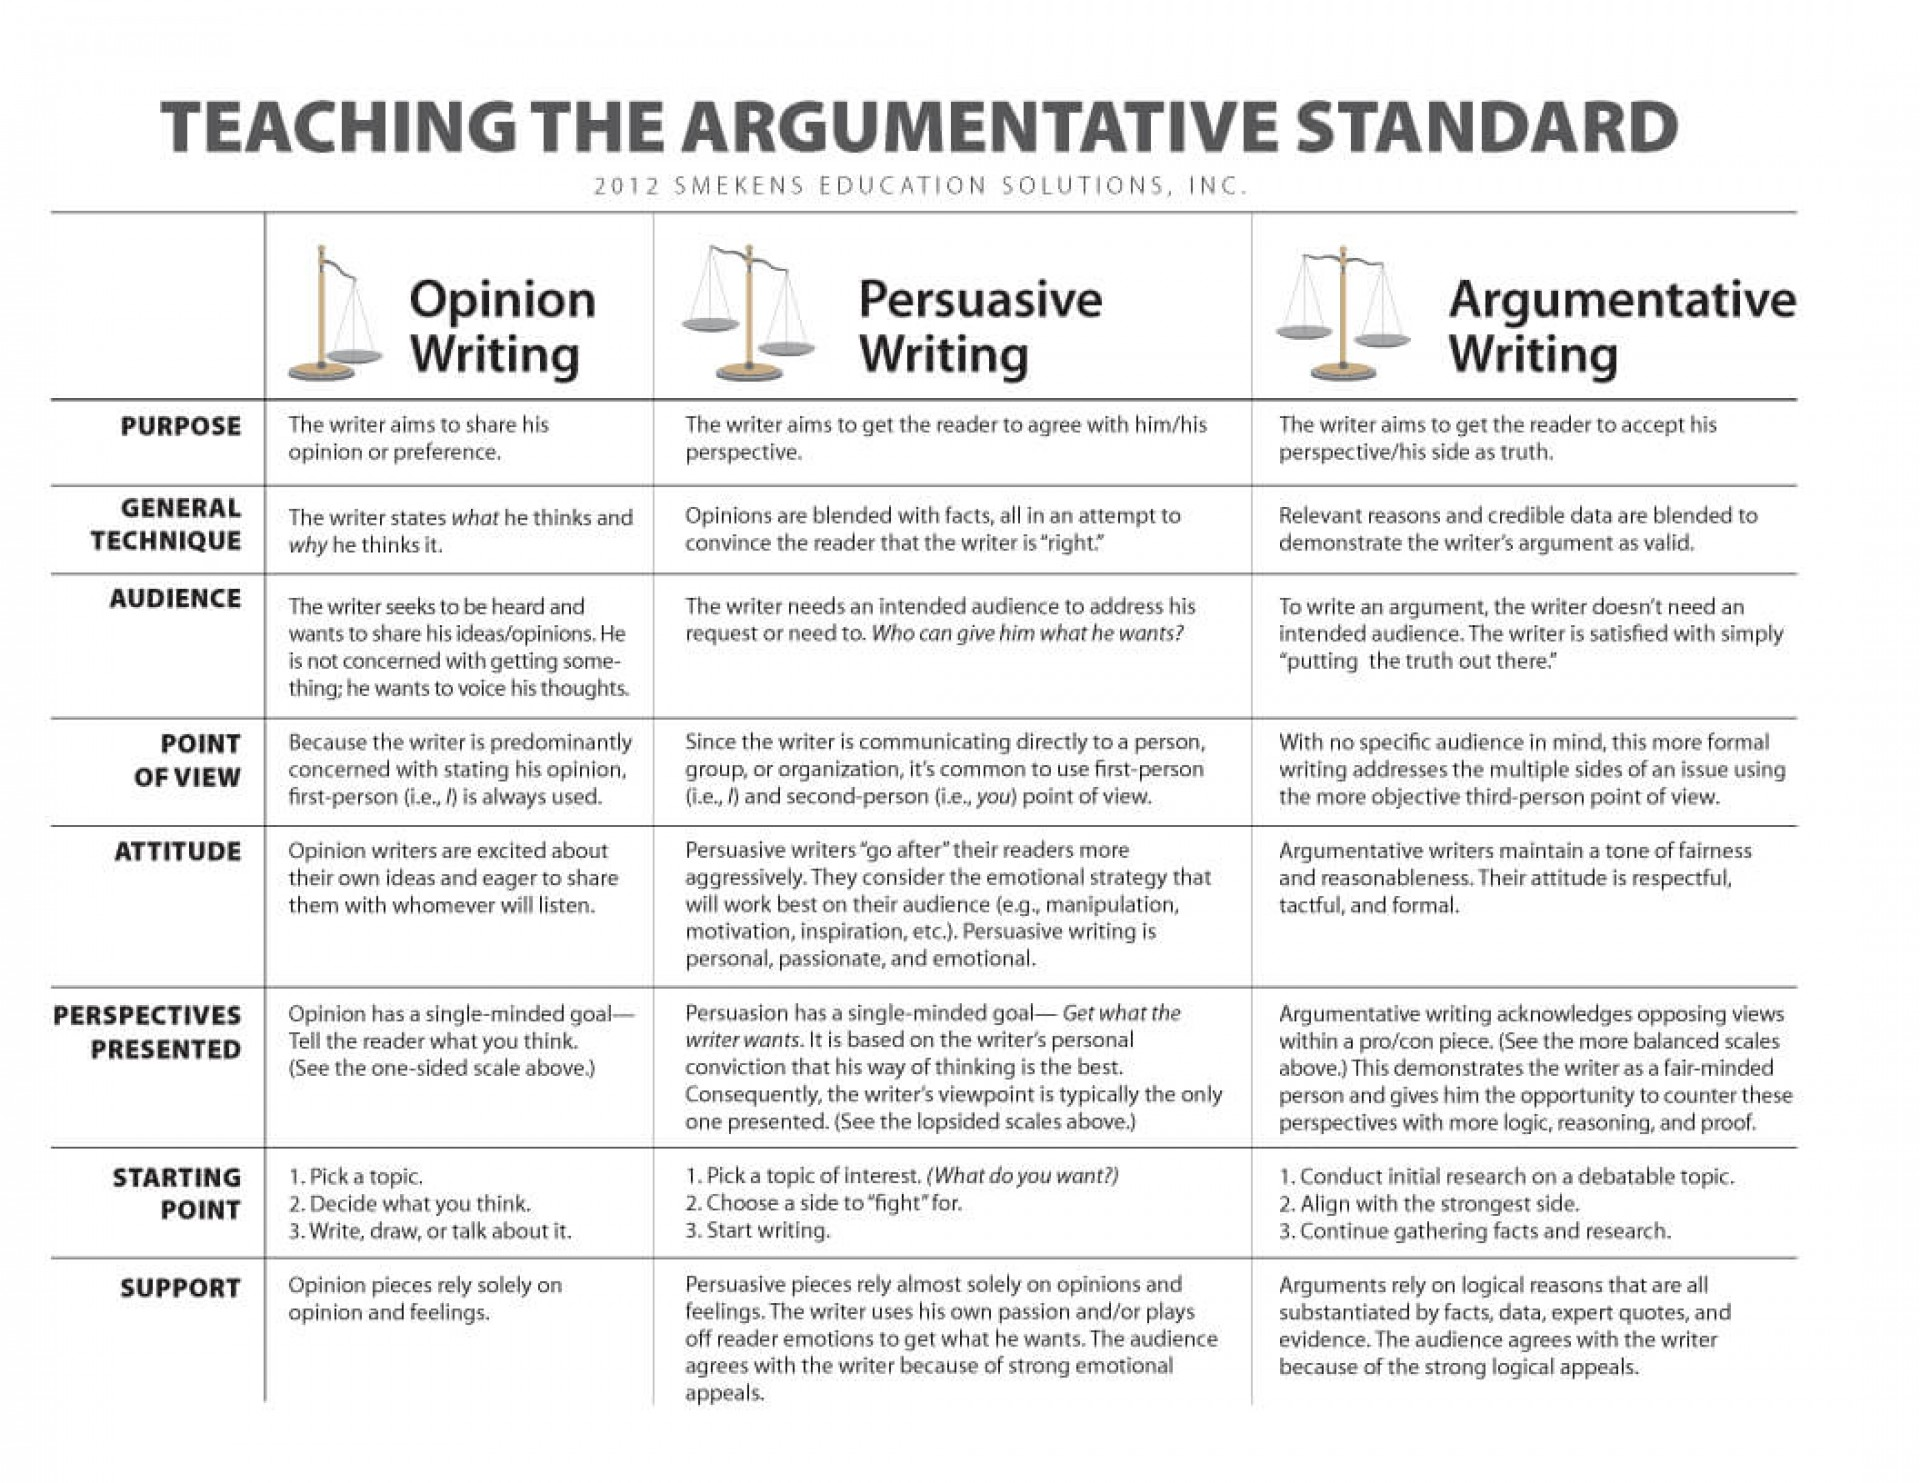 001 Teaching The Argumetative Standardo Persuasive Vs Argumentative Essay Awful Are And Essays Same Differentiate 1920